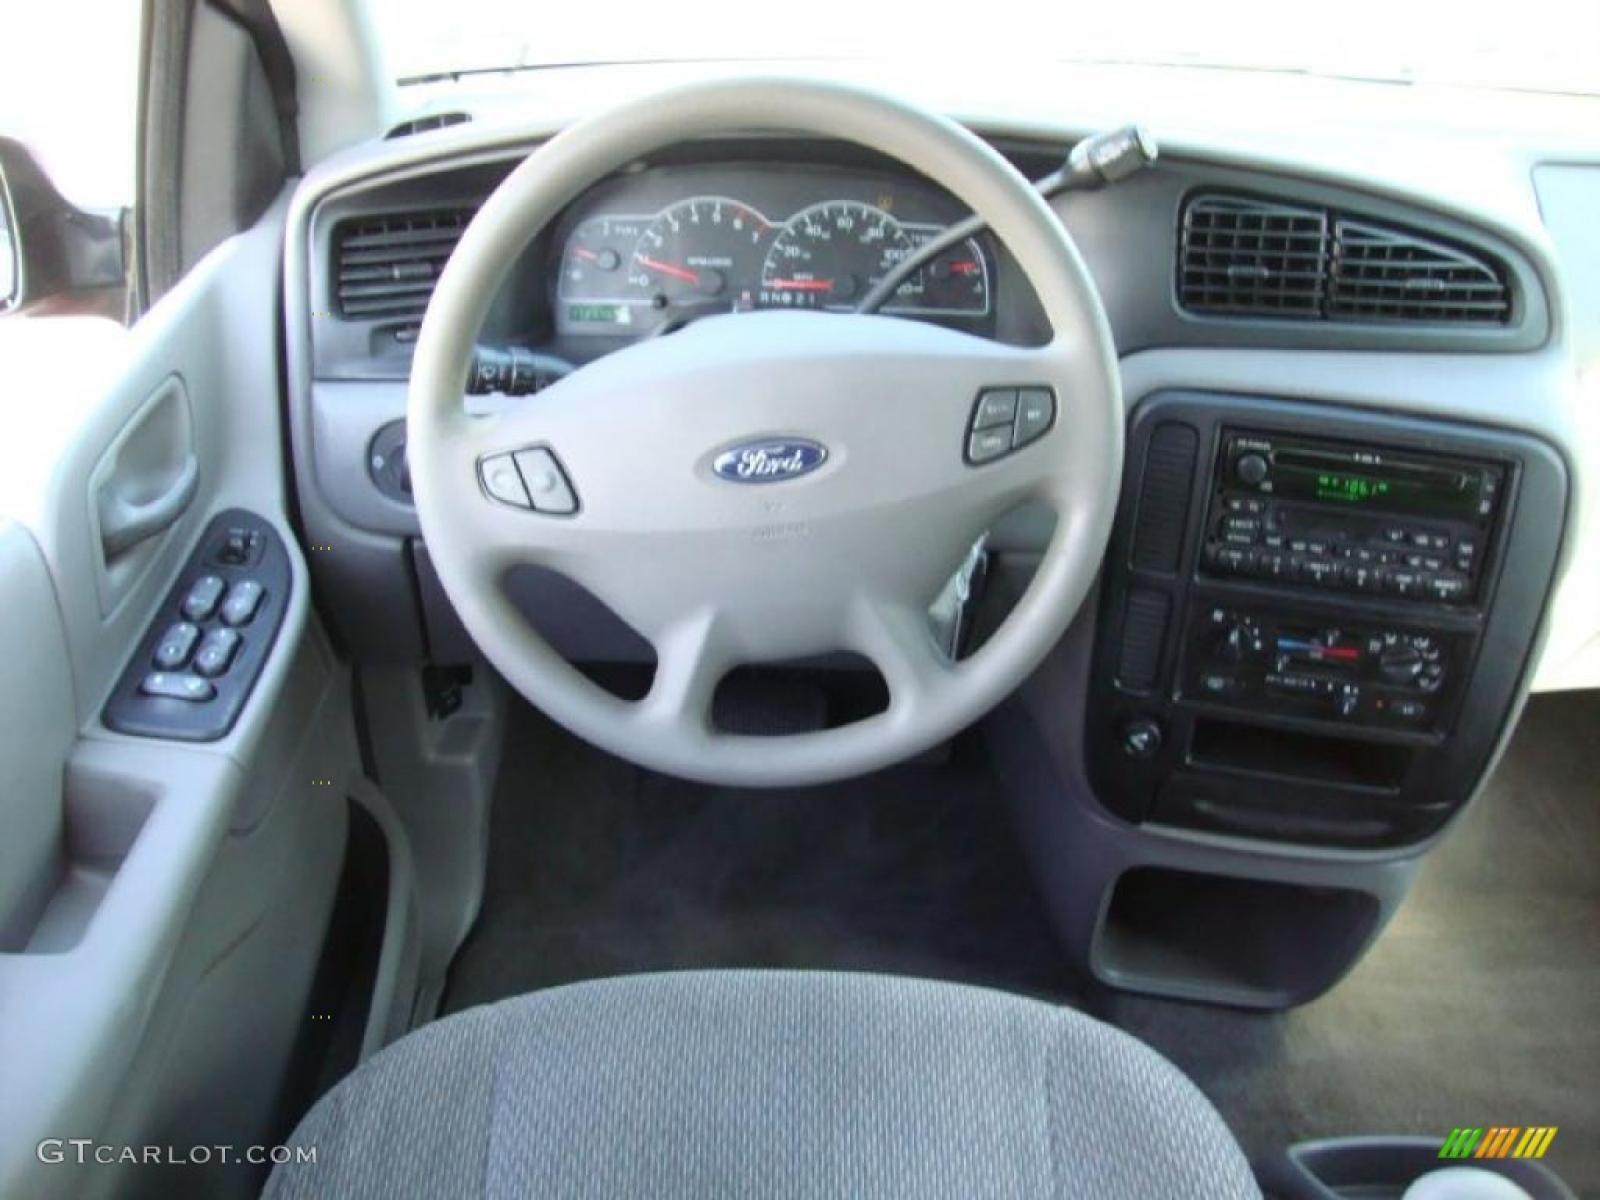 800 1024 1280 1600 origin 2002 ford windstar